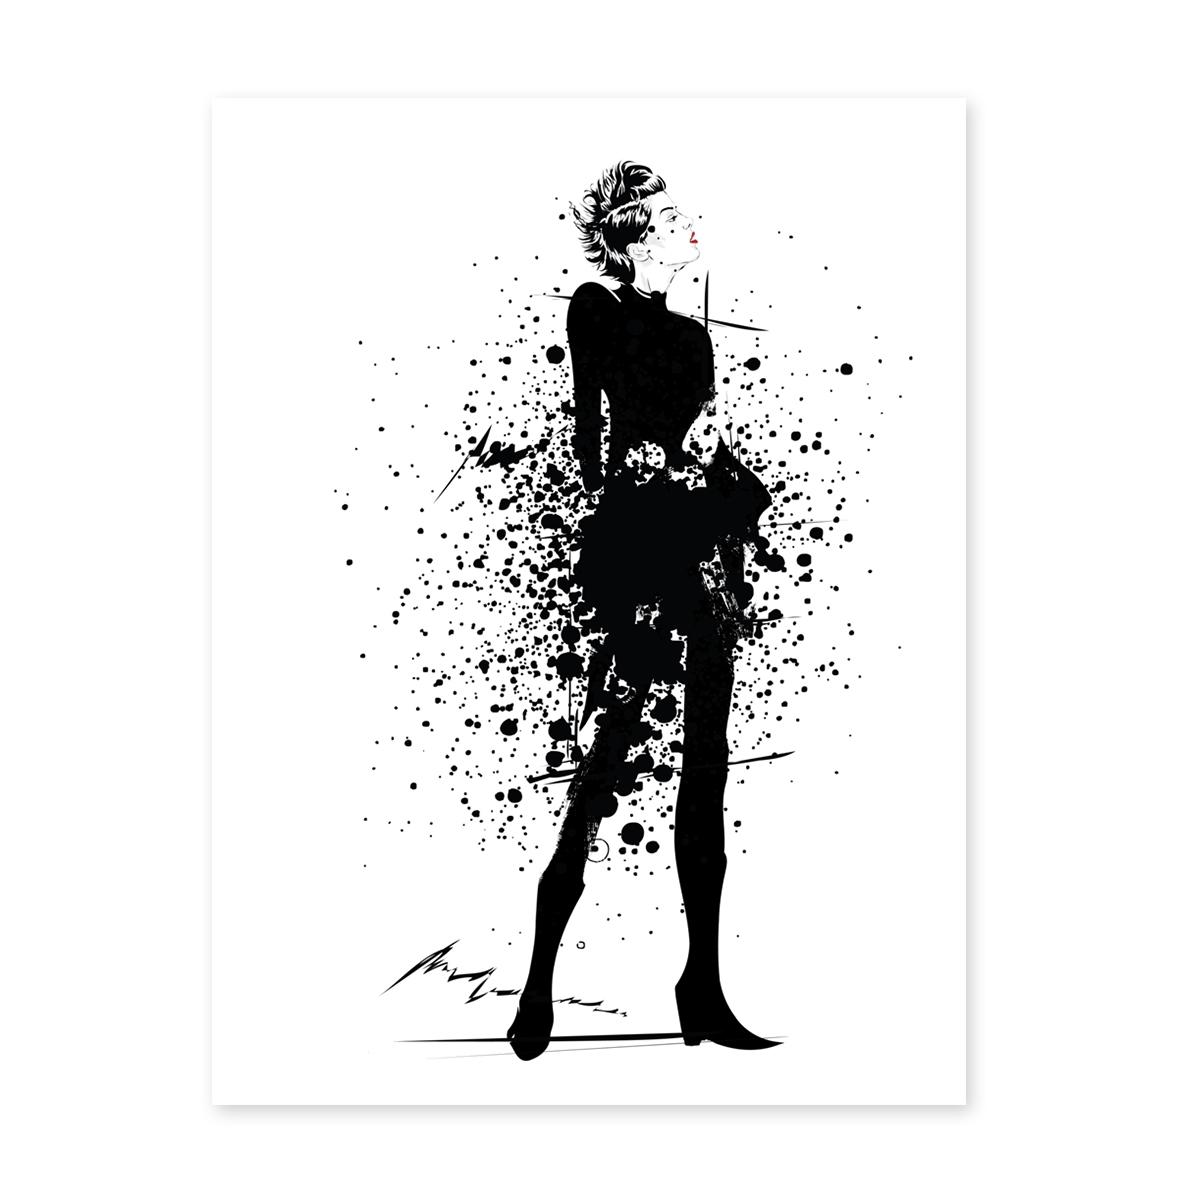 73615980cfbd2 Design-Poster 'Fashion' 30x40 cm schwarz-weiss Frau Splash-Look ...